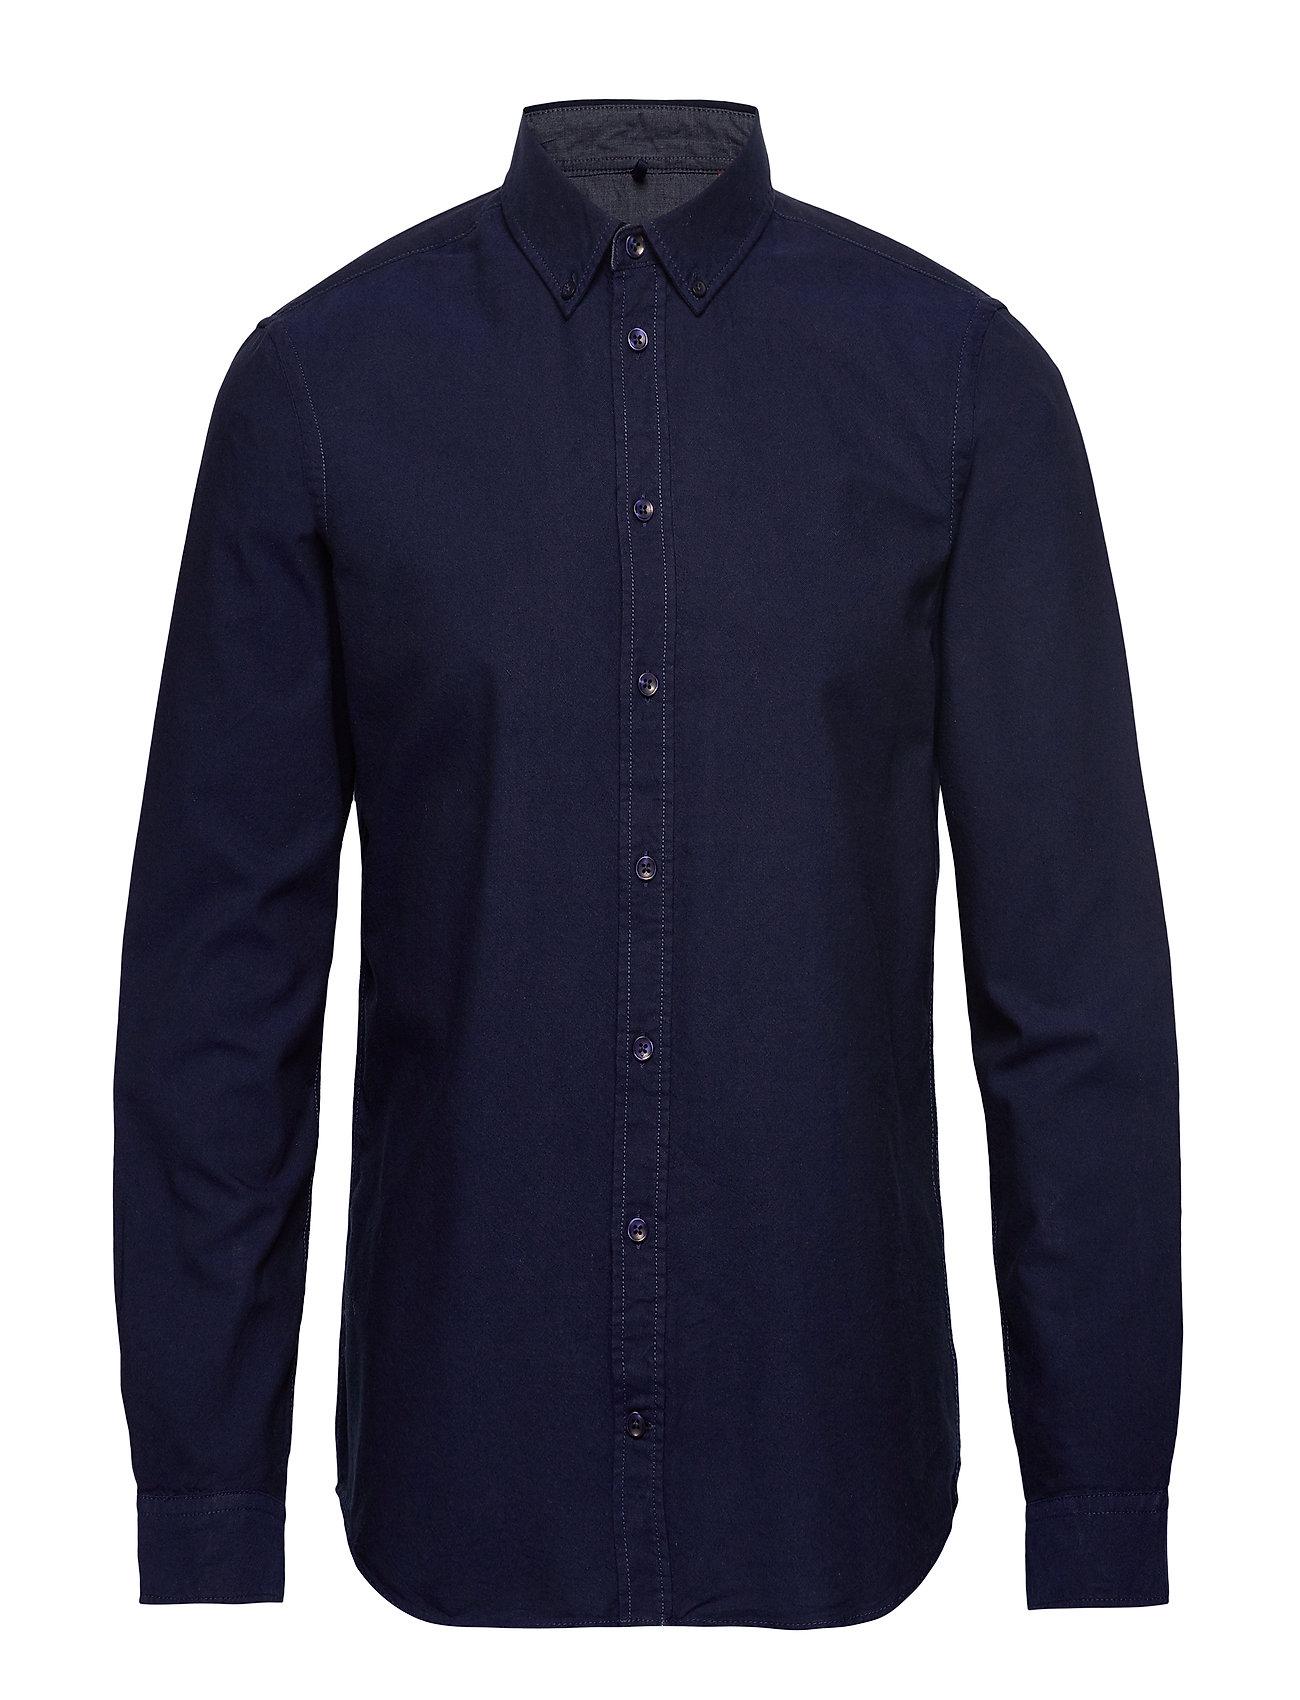 Blend BHNAIL shirt - NAVY